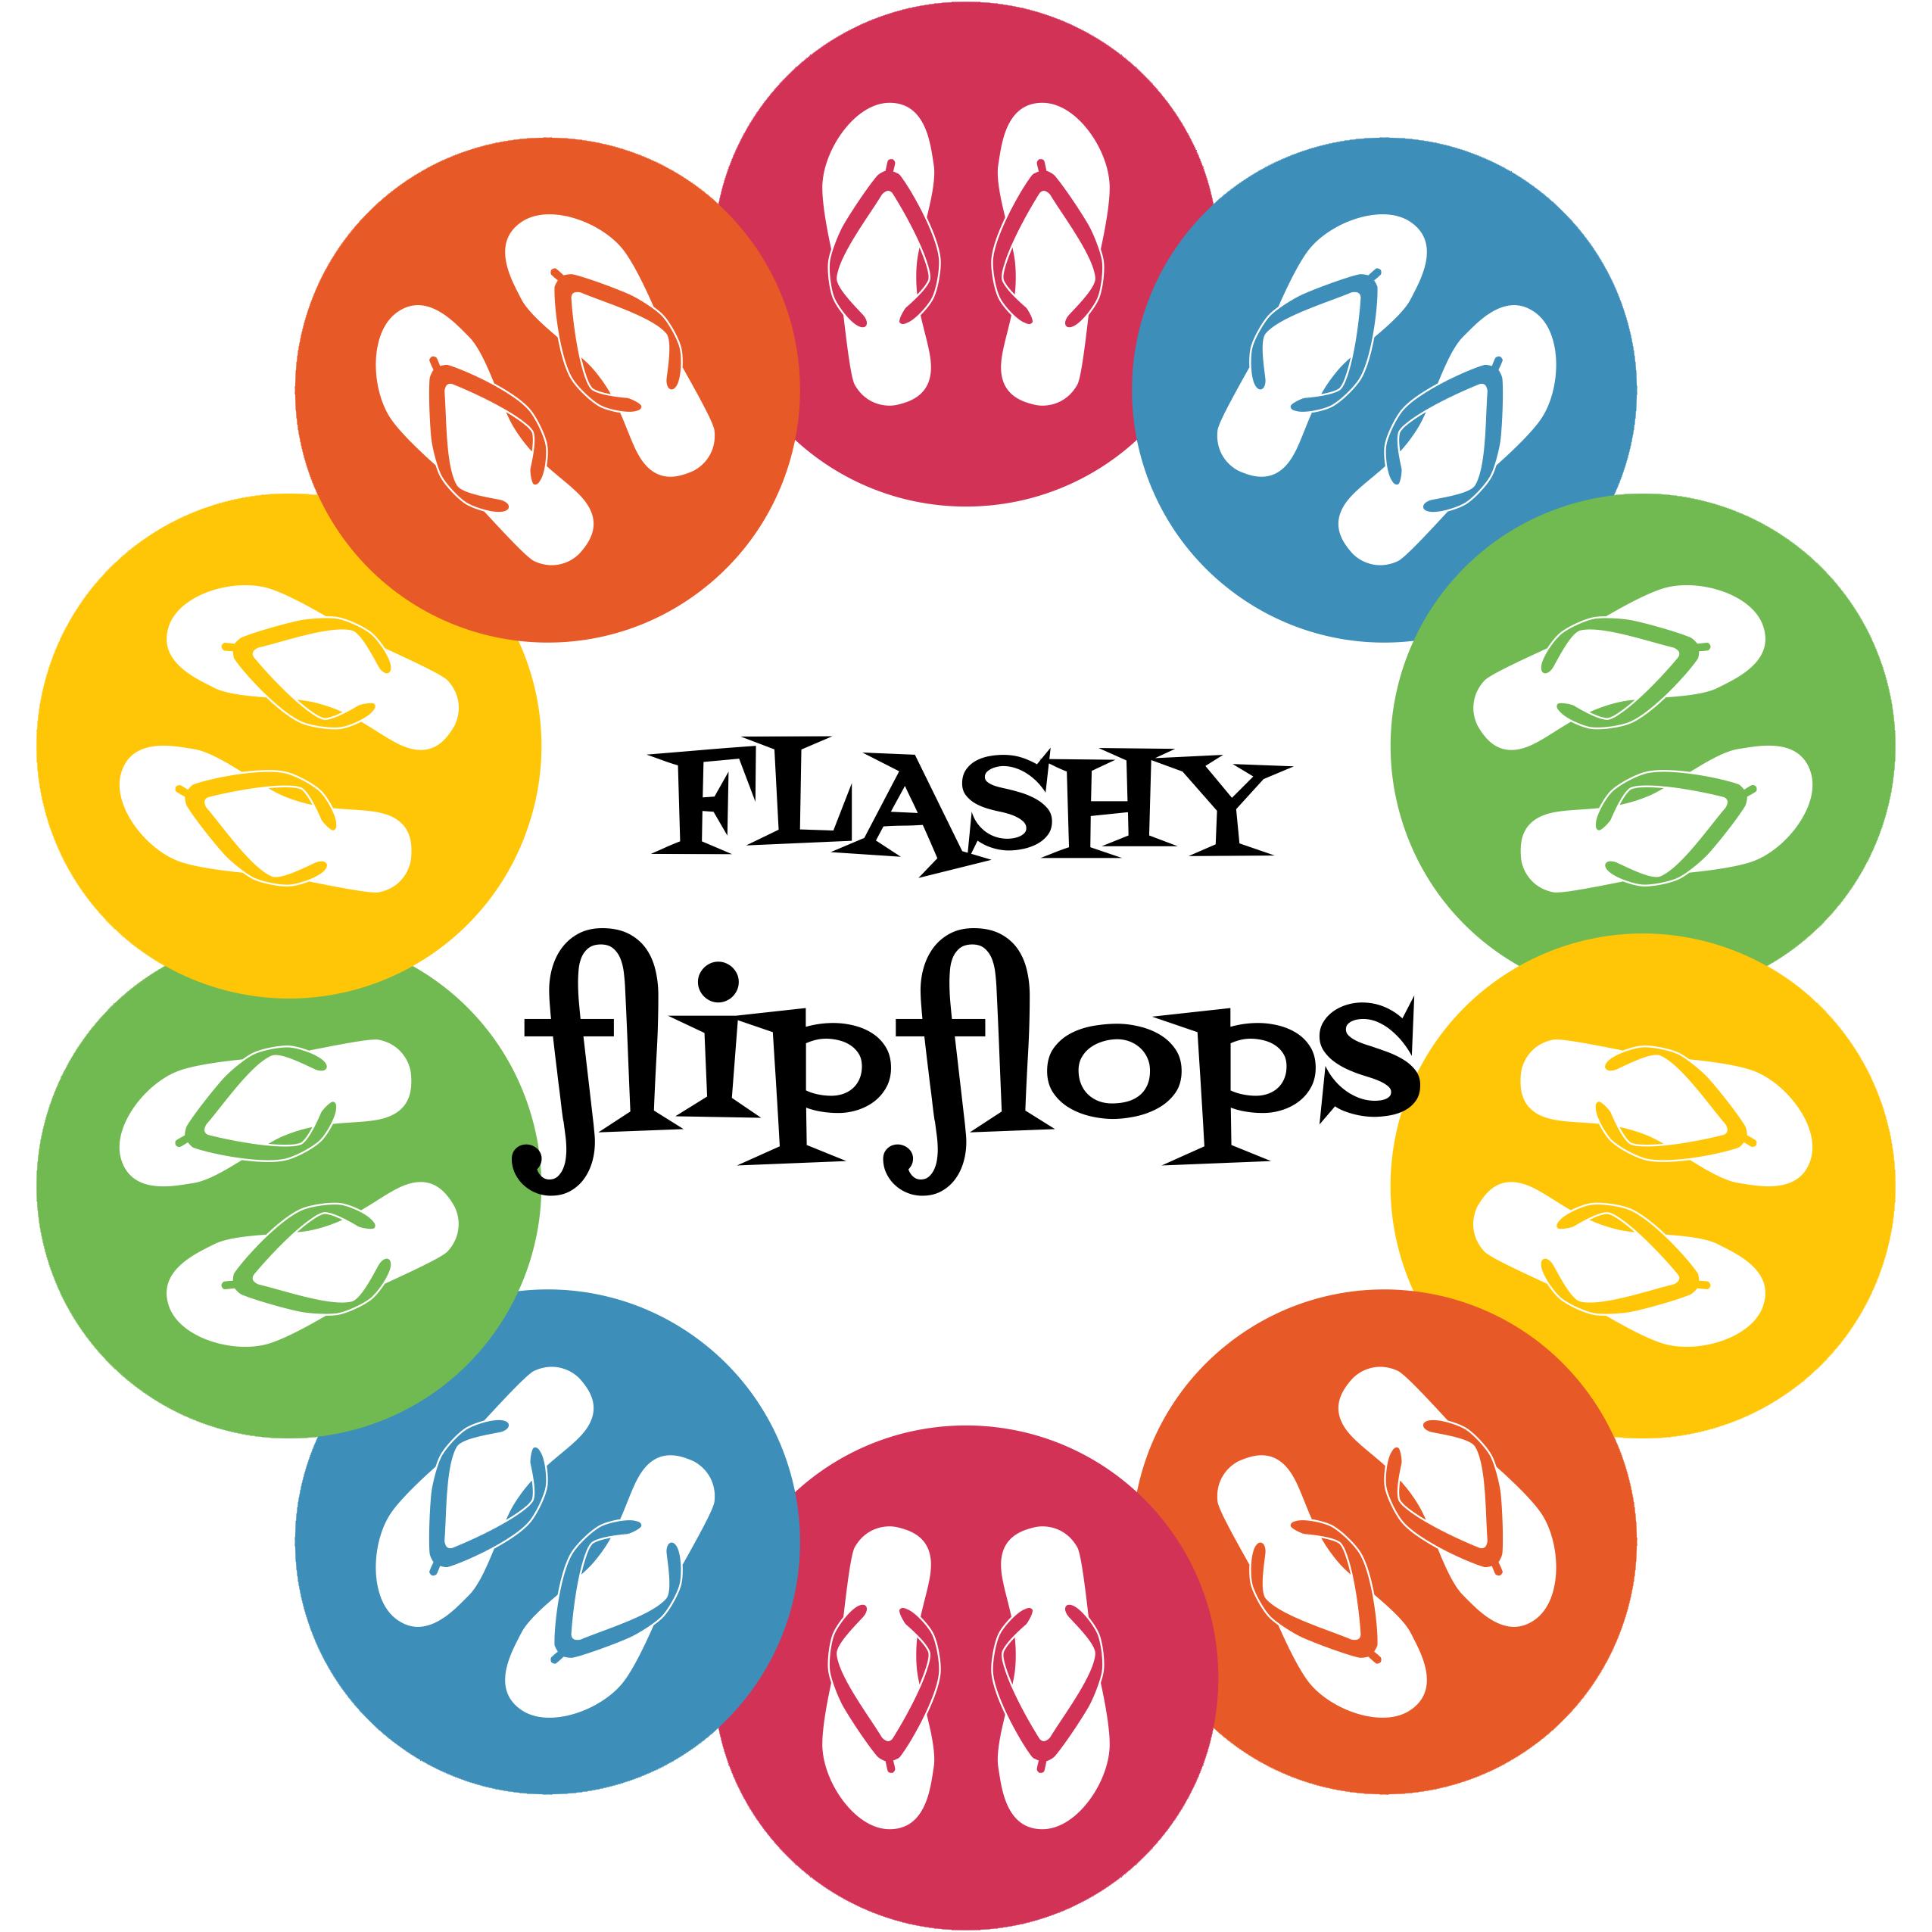 Flash clipart flashy. Design templates tahoe flips